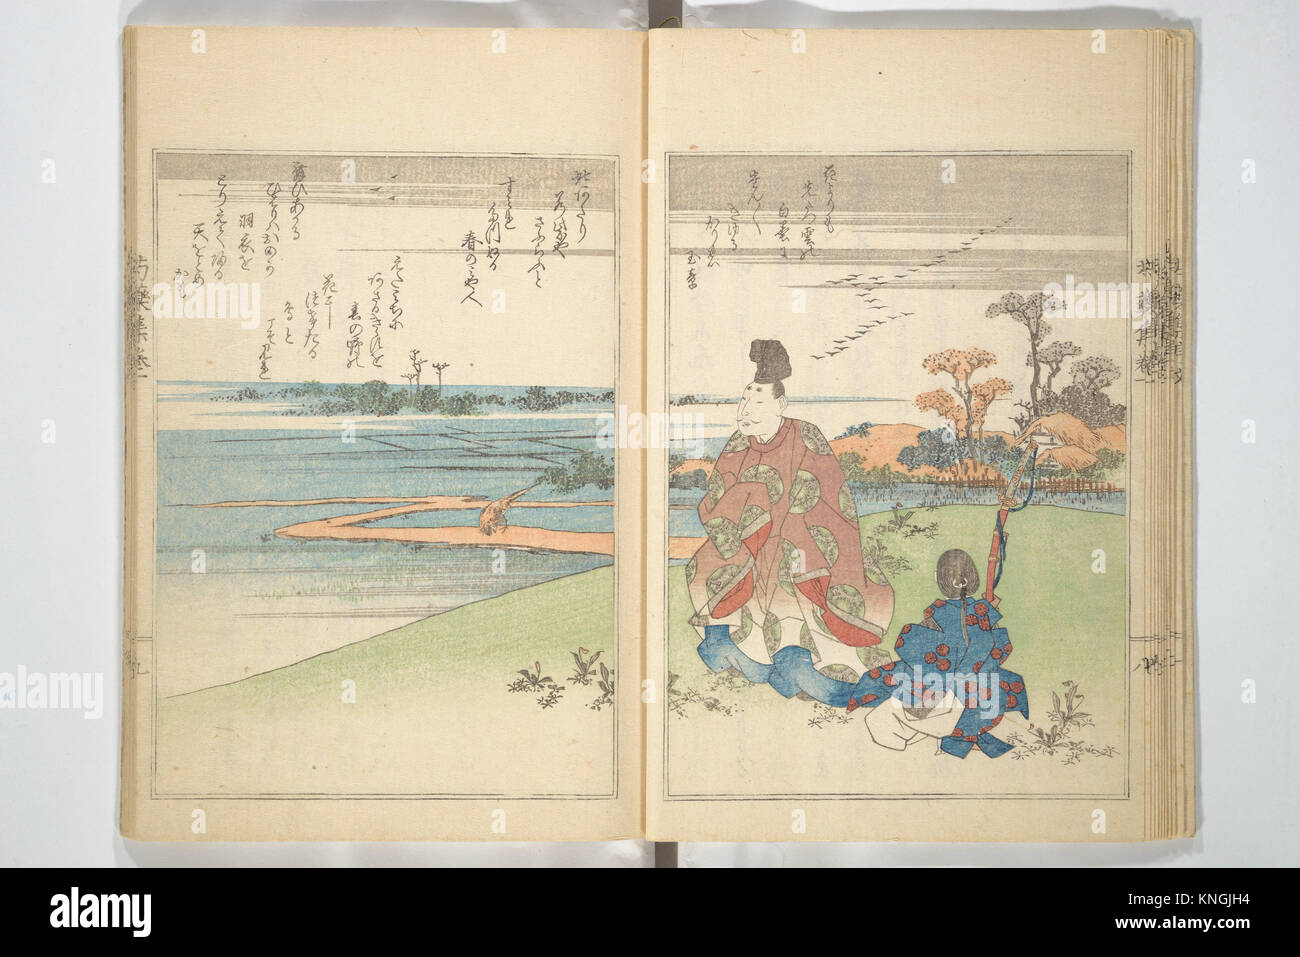 Collection of Famous Kyoka Poems Selected by Shakuyakutei (Shakuyakutei bunshu meishu kyokashu). Artist: Shakuyakutei - Stock Image